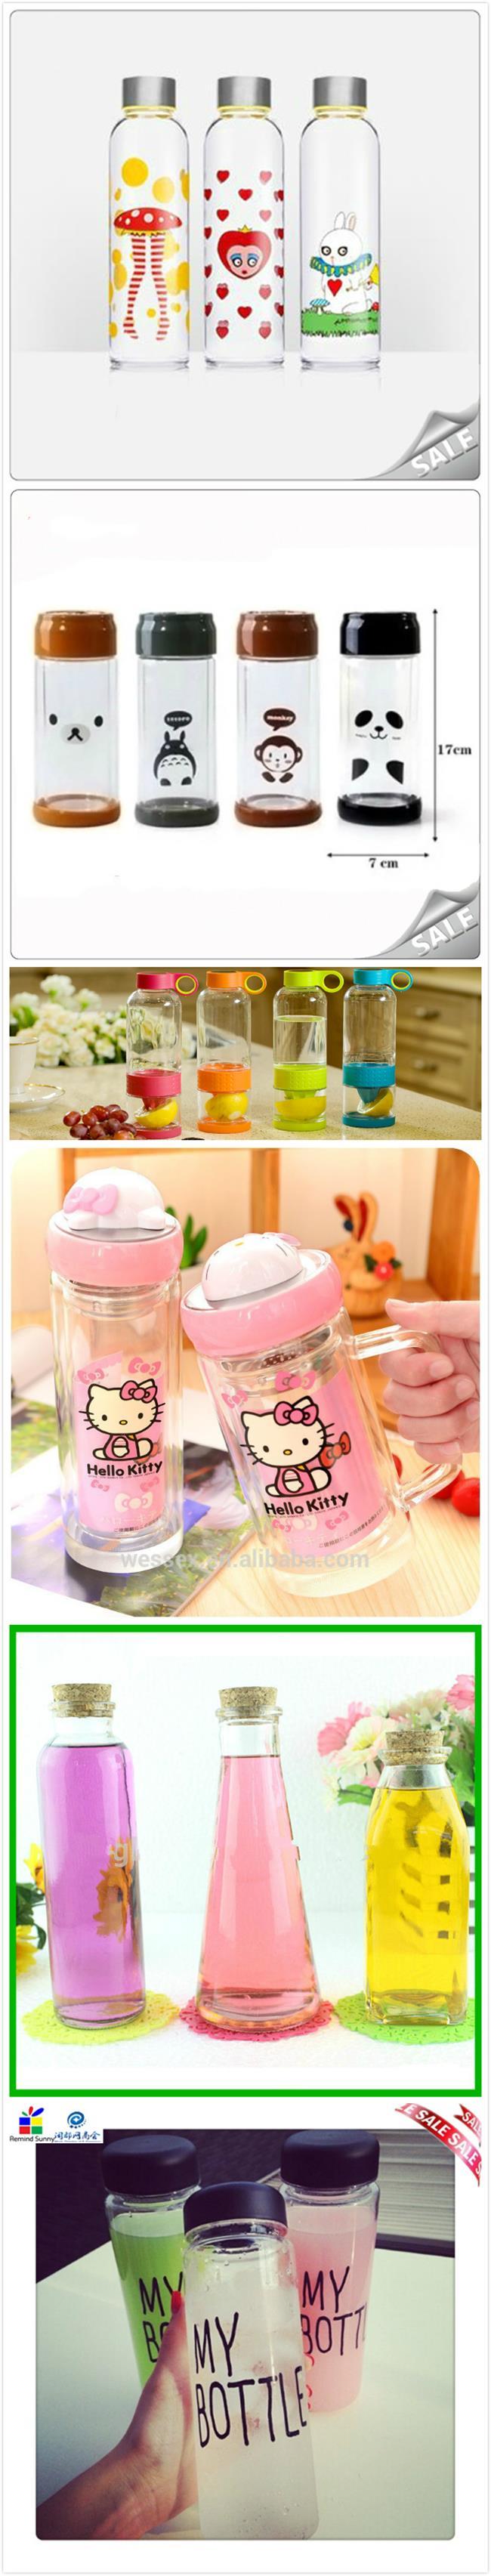 Wholesale Transparent Mason Jar for Beverage Glass Milk Bottle with Cover